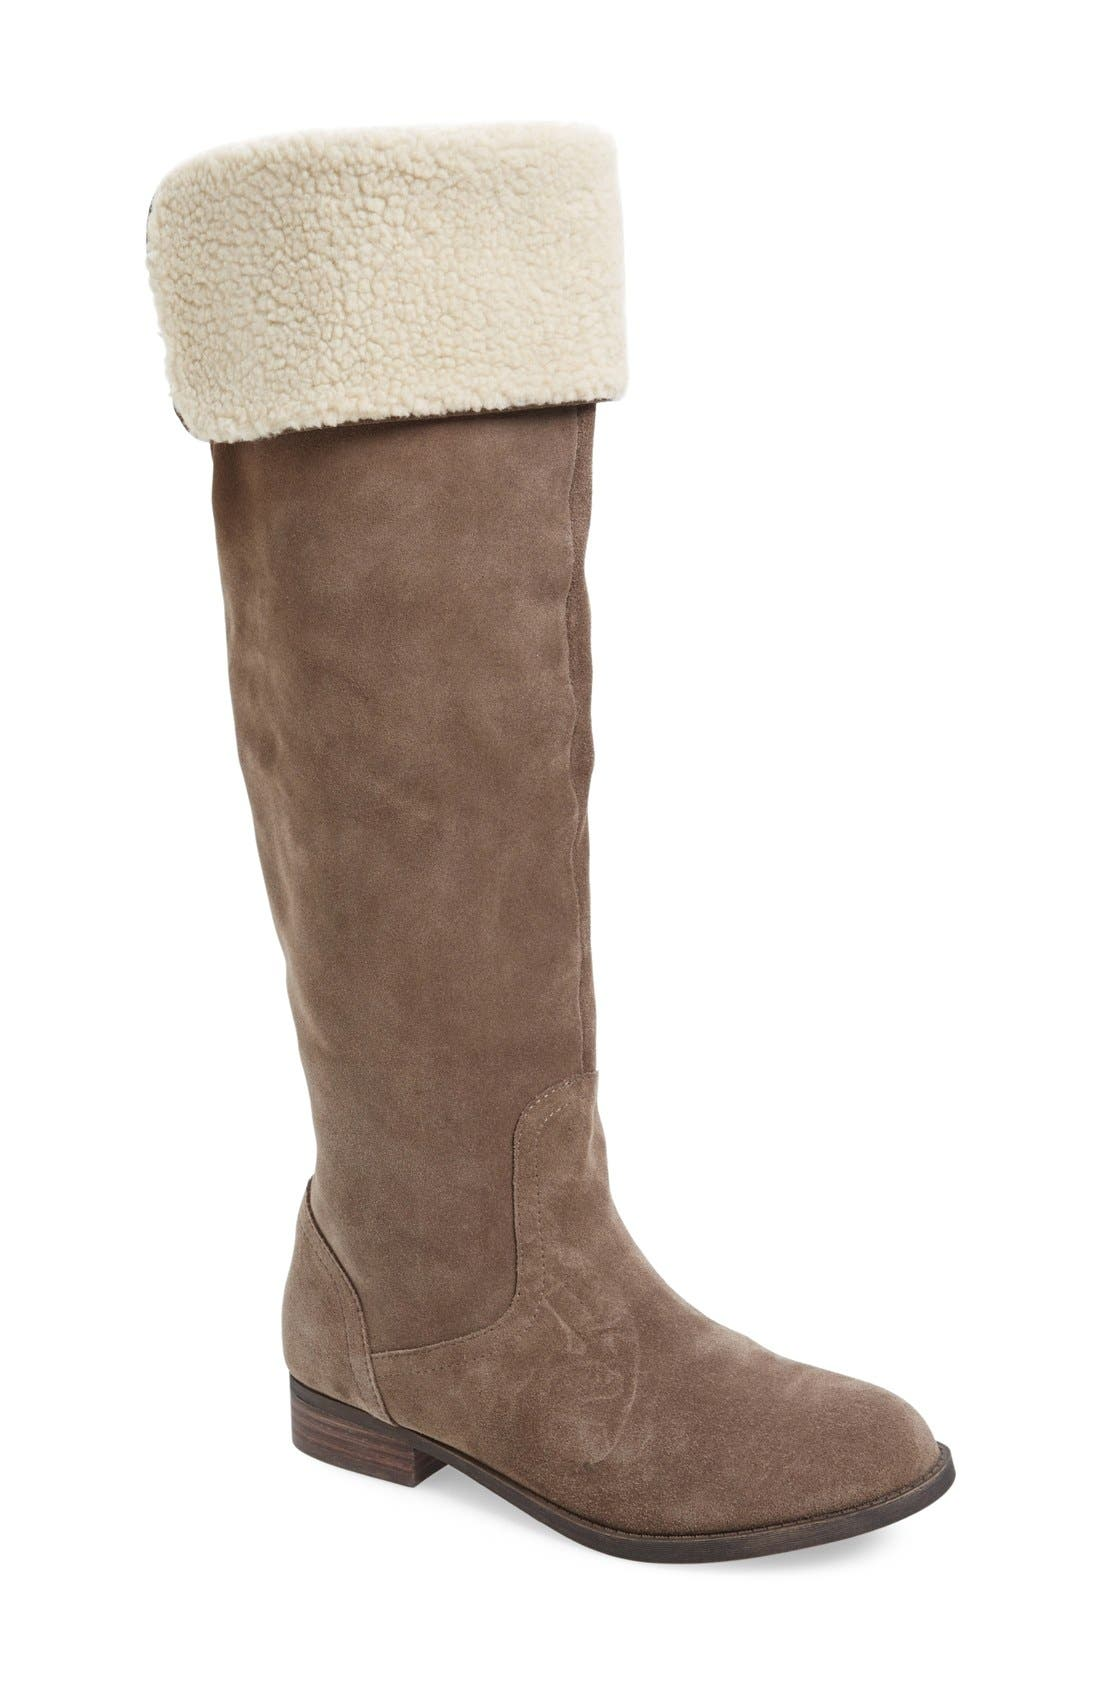 Main Image - Sole Society 'Lanee' Tall Boot (Women)